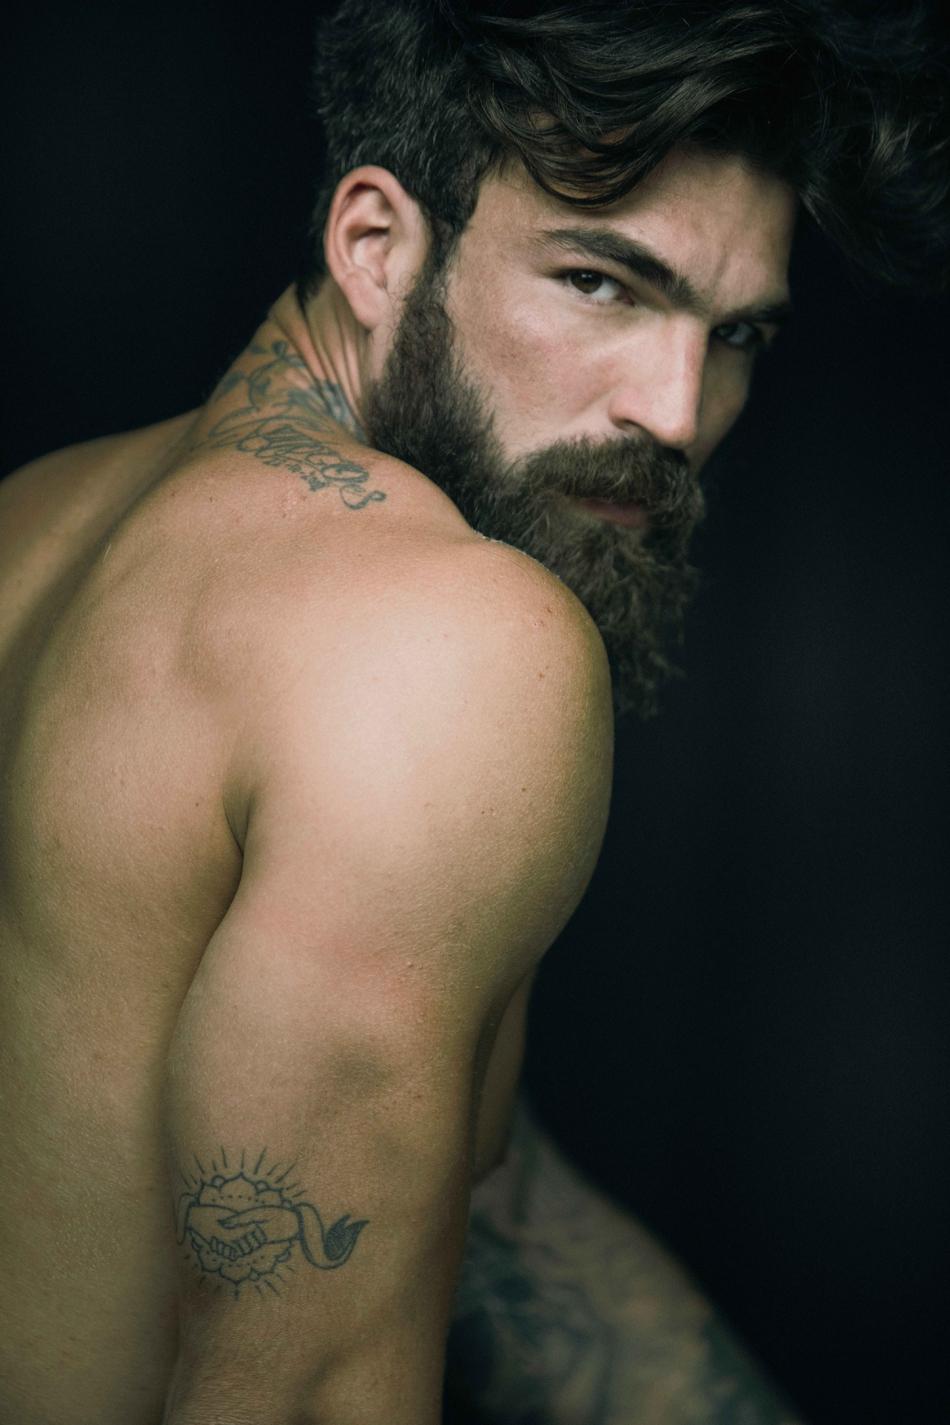 valero-rioja-photography-celebrity-dimitris-alexandrou